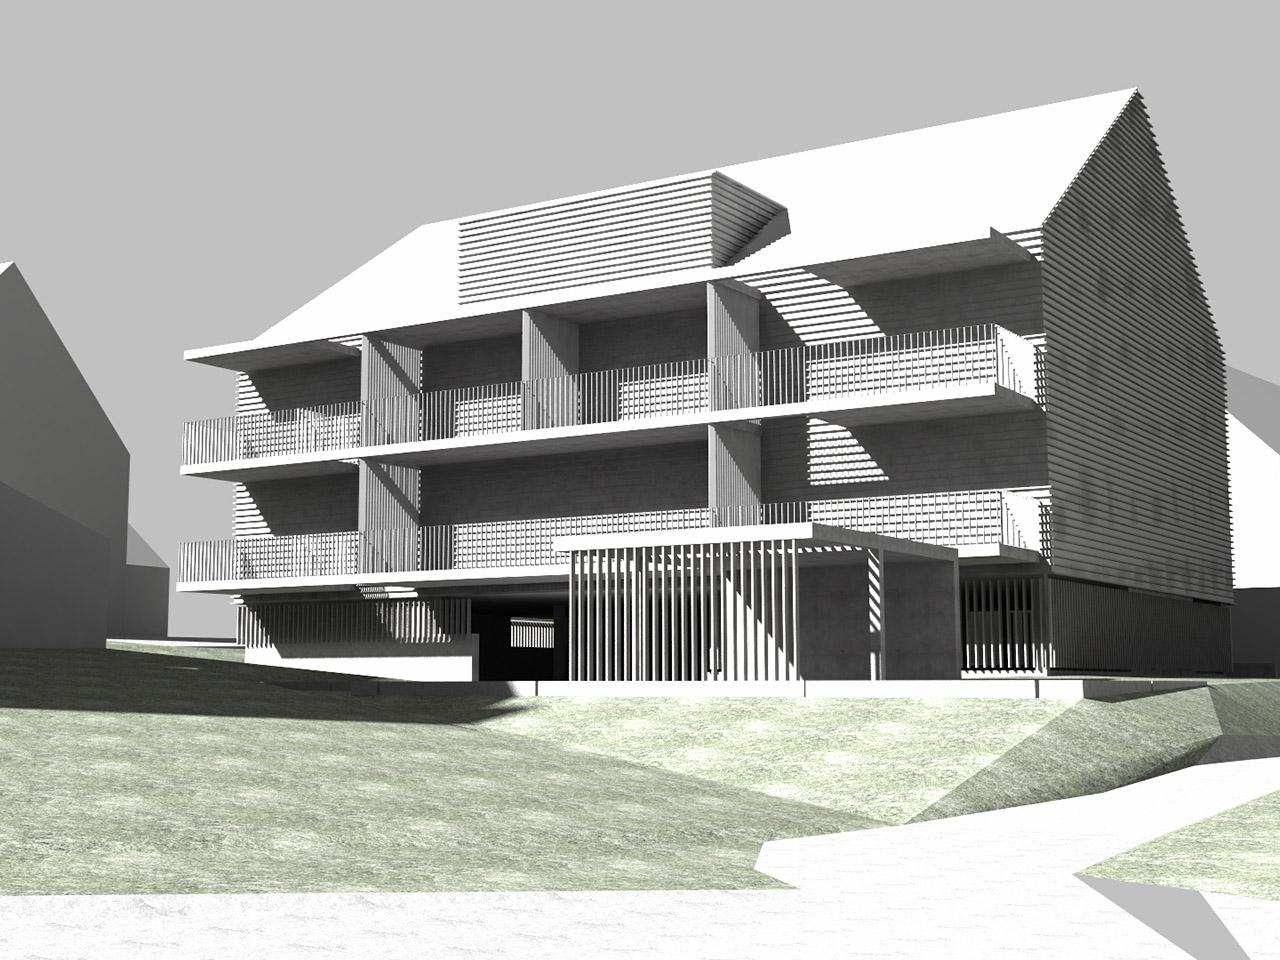 laubhus-architektur-mehrfamilienhaus-kuettigen-studie